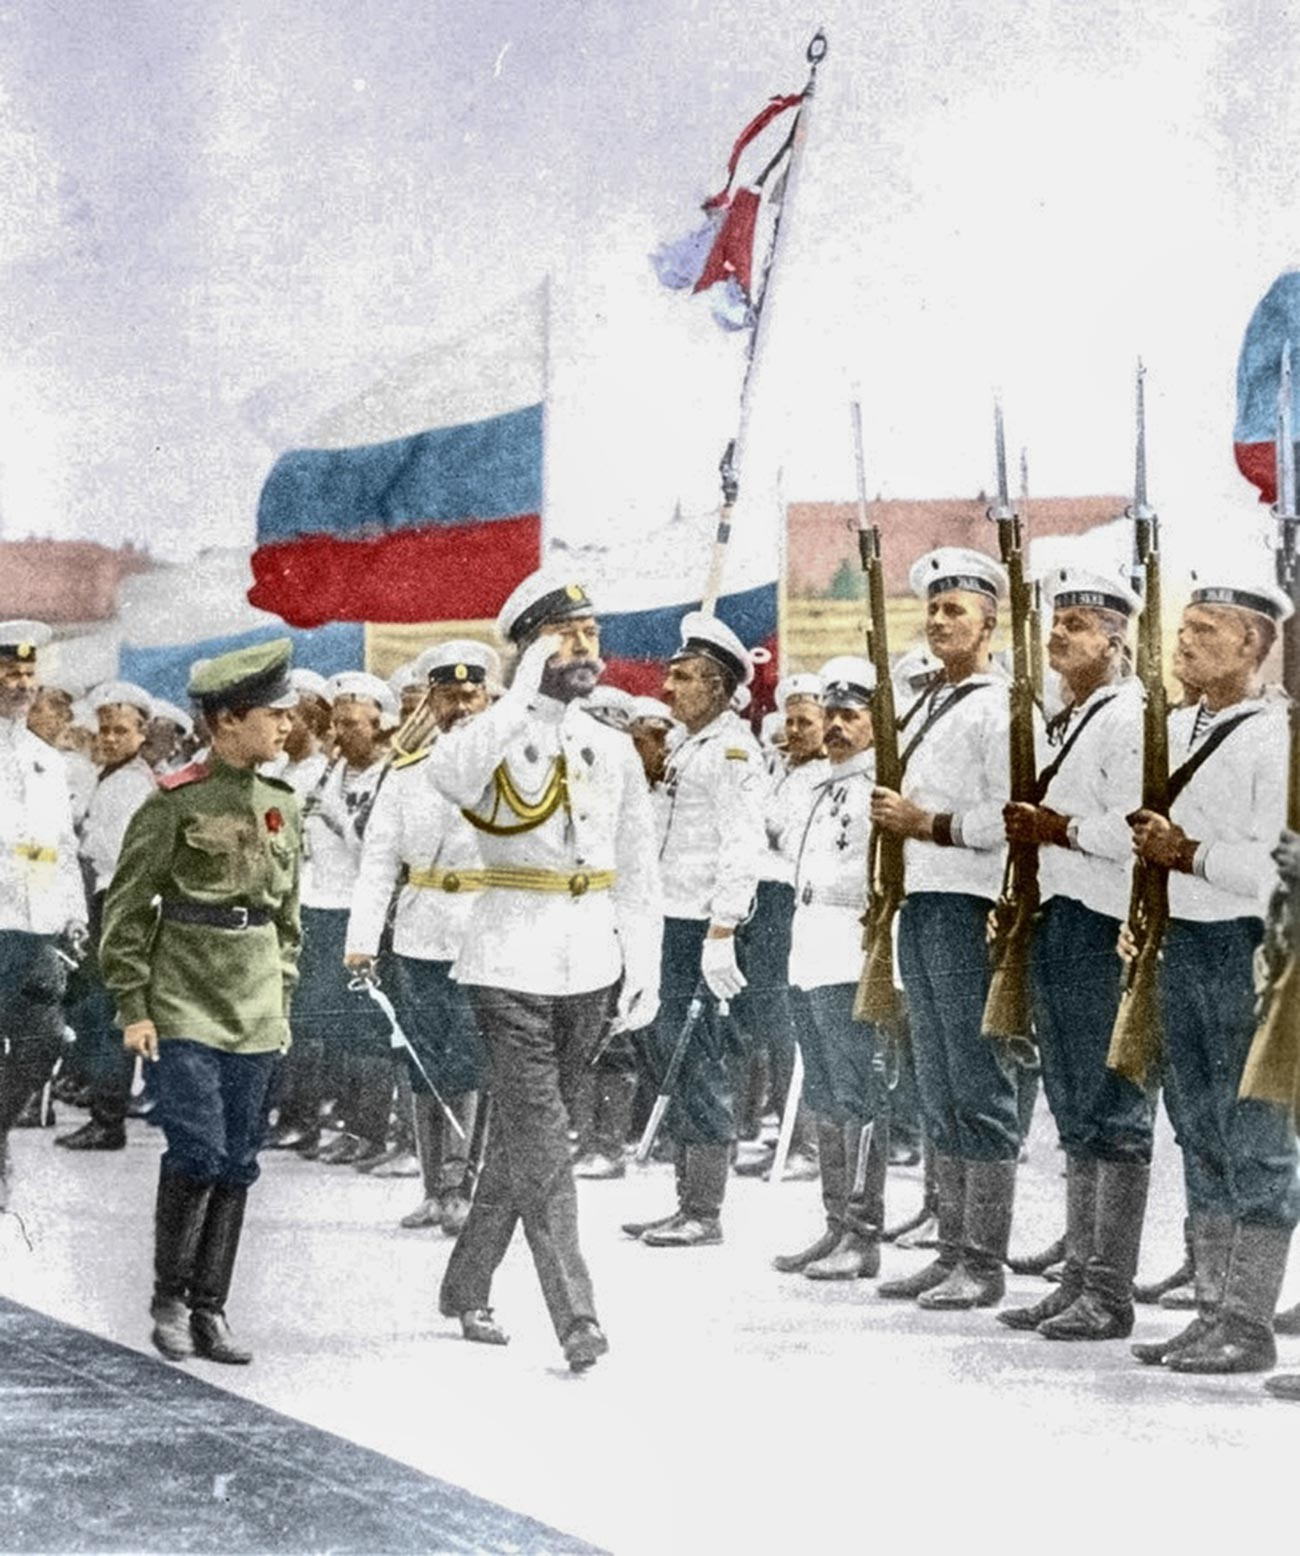 Nikolai II menetapkan bendera putih-biru-merah sebagai bendera nasional Rusia pada 1896.